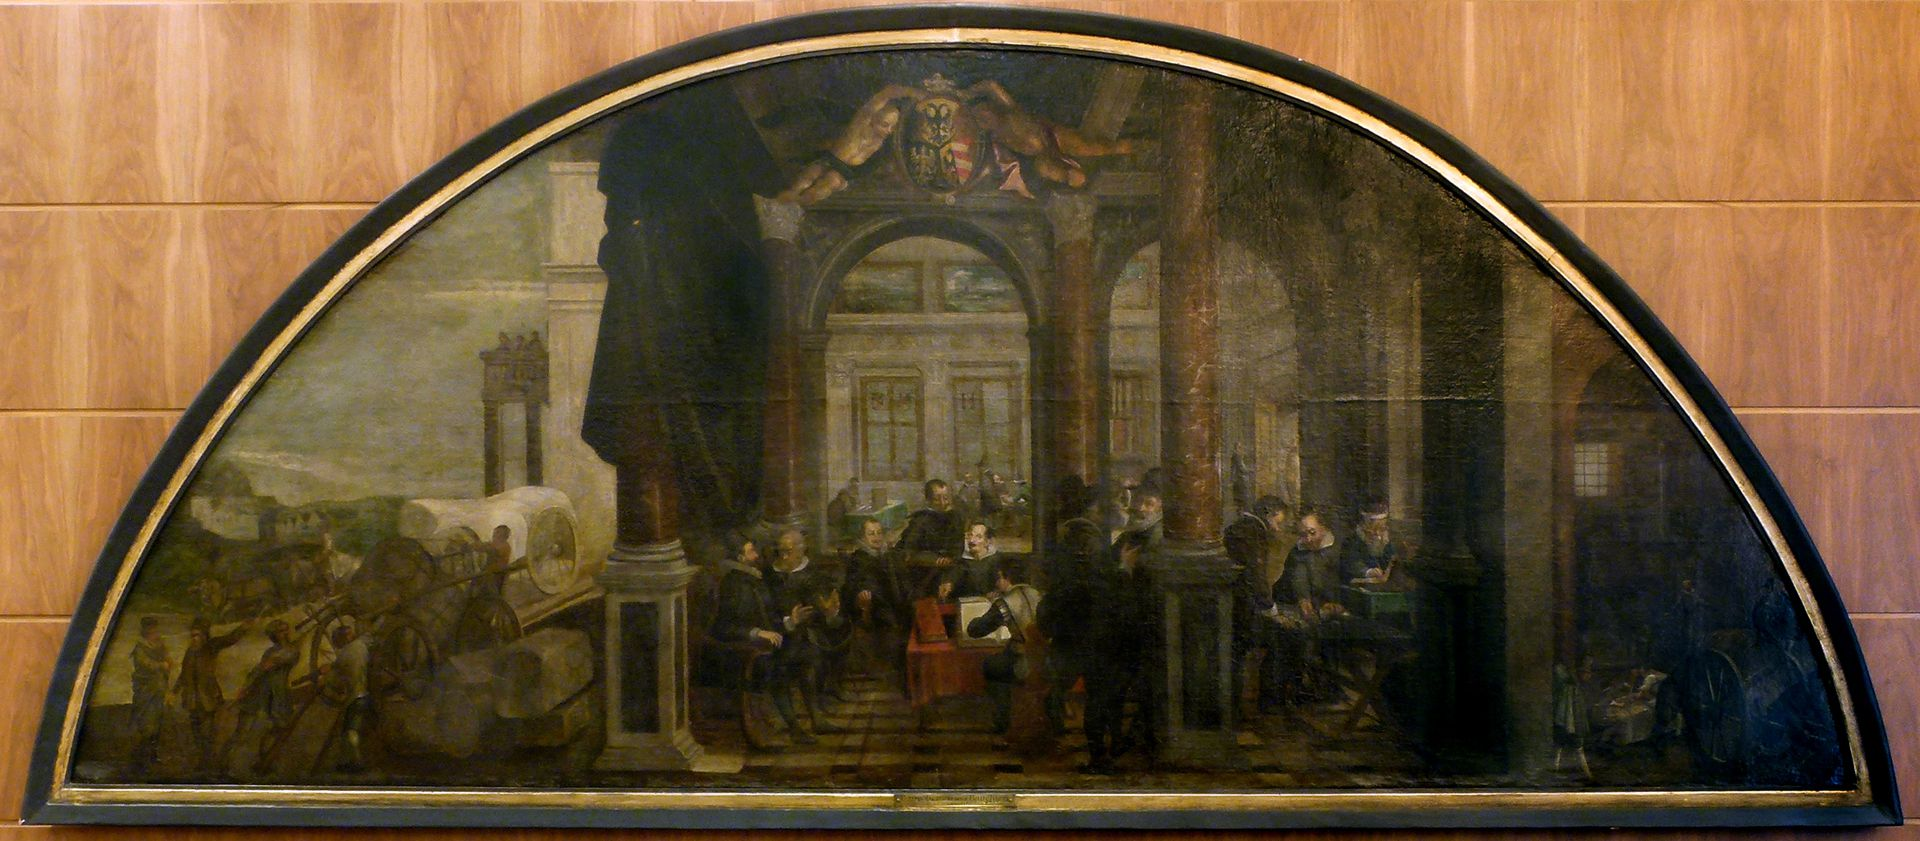 Bancoherren und Banchieri (gentlemen-bankers and banchieri) Lunette Picture